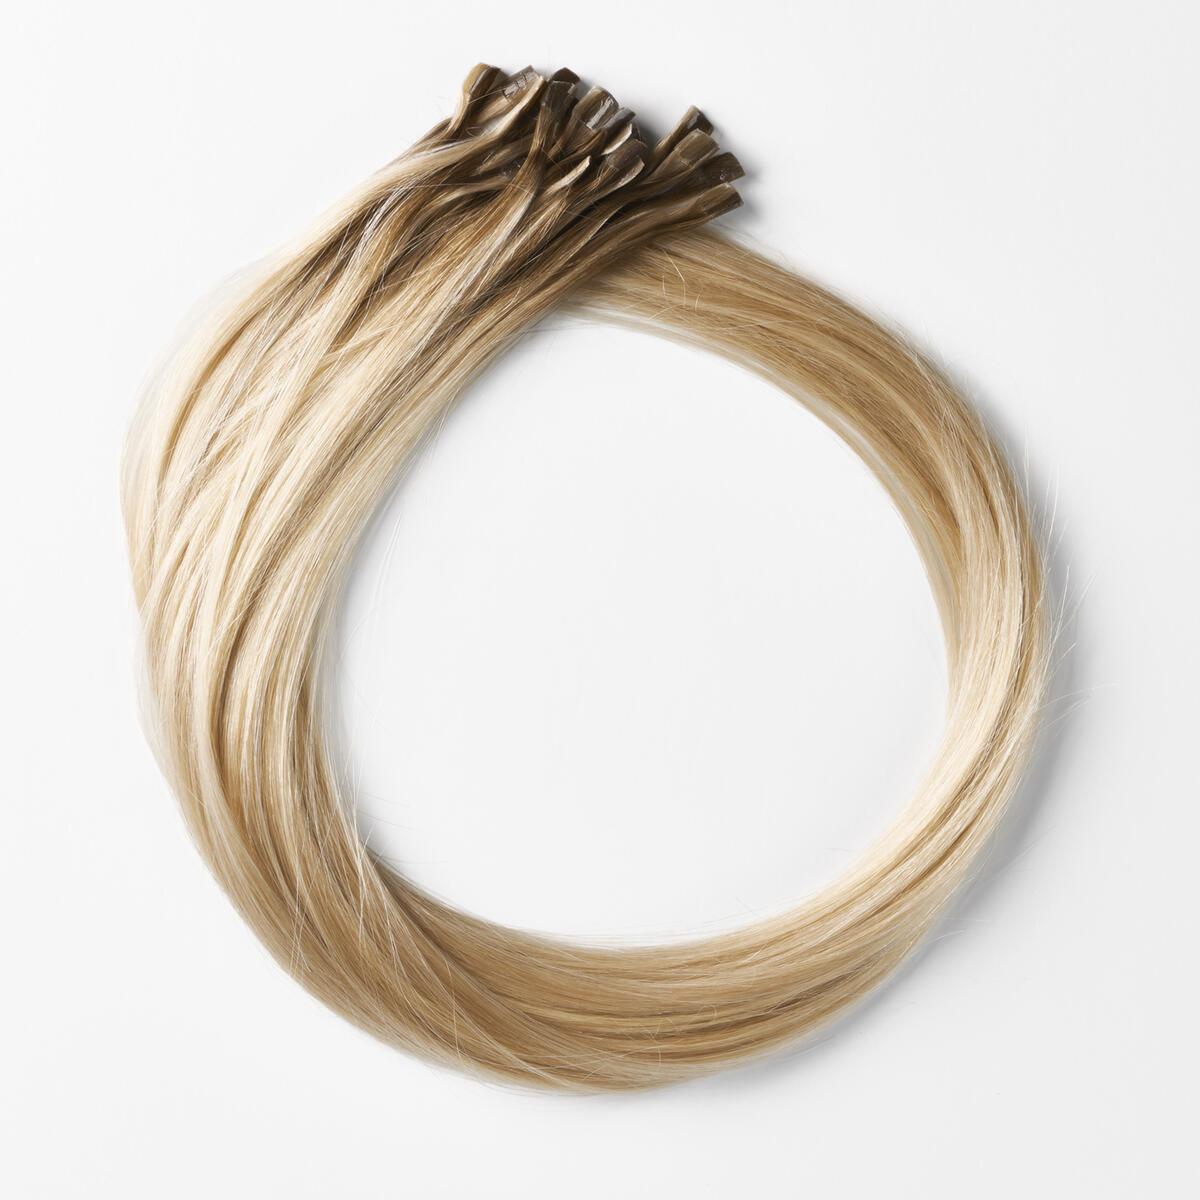 Nail Hair C7.3/8.3 Brilliant Blonde ColorMelt 40 cm